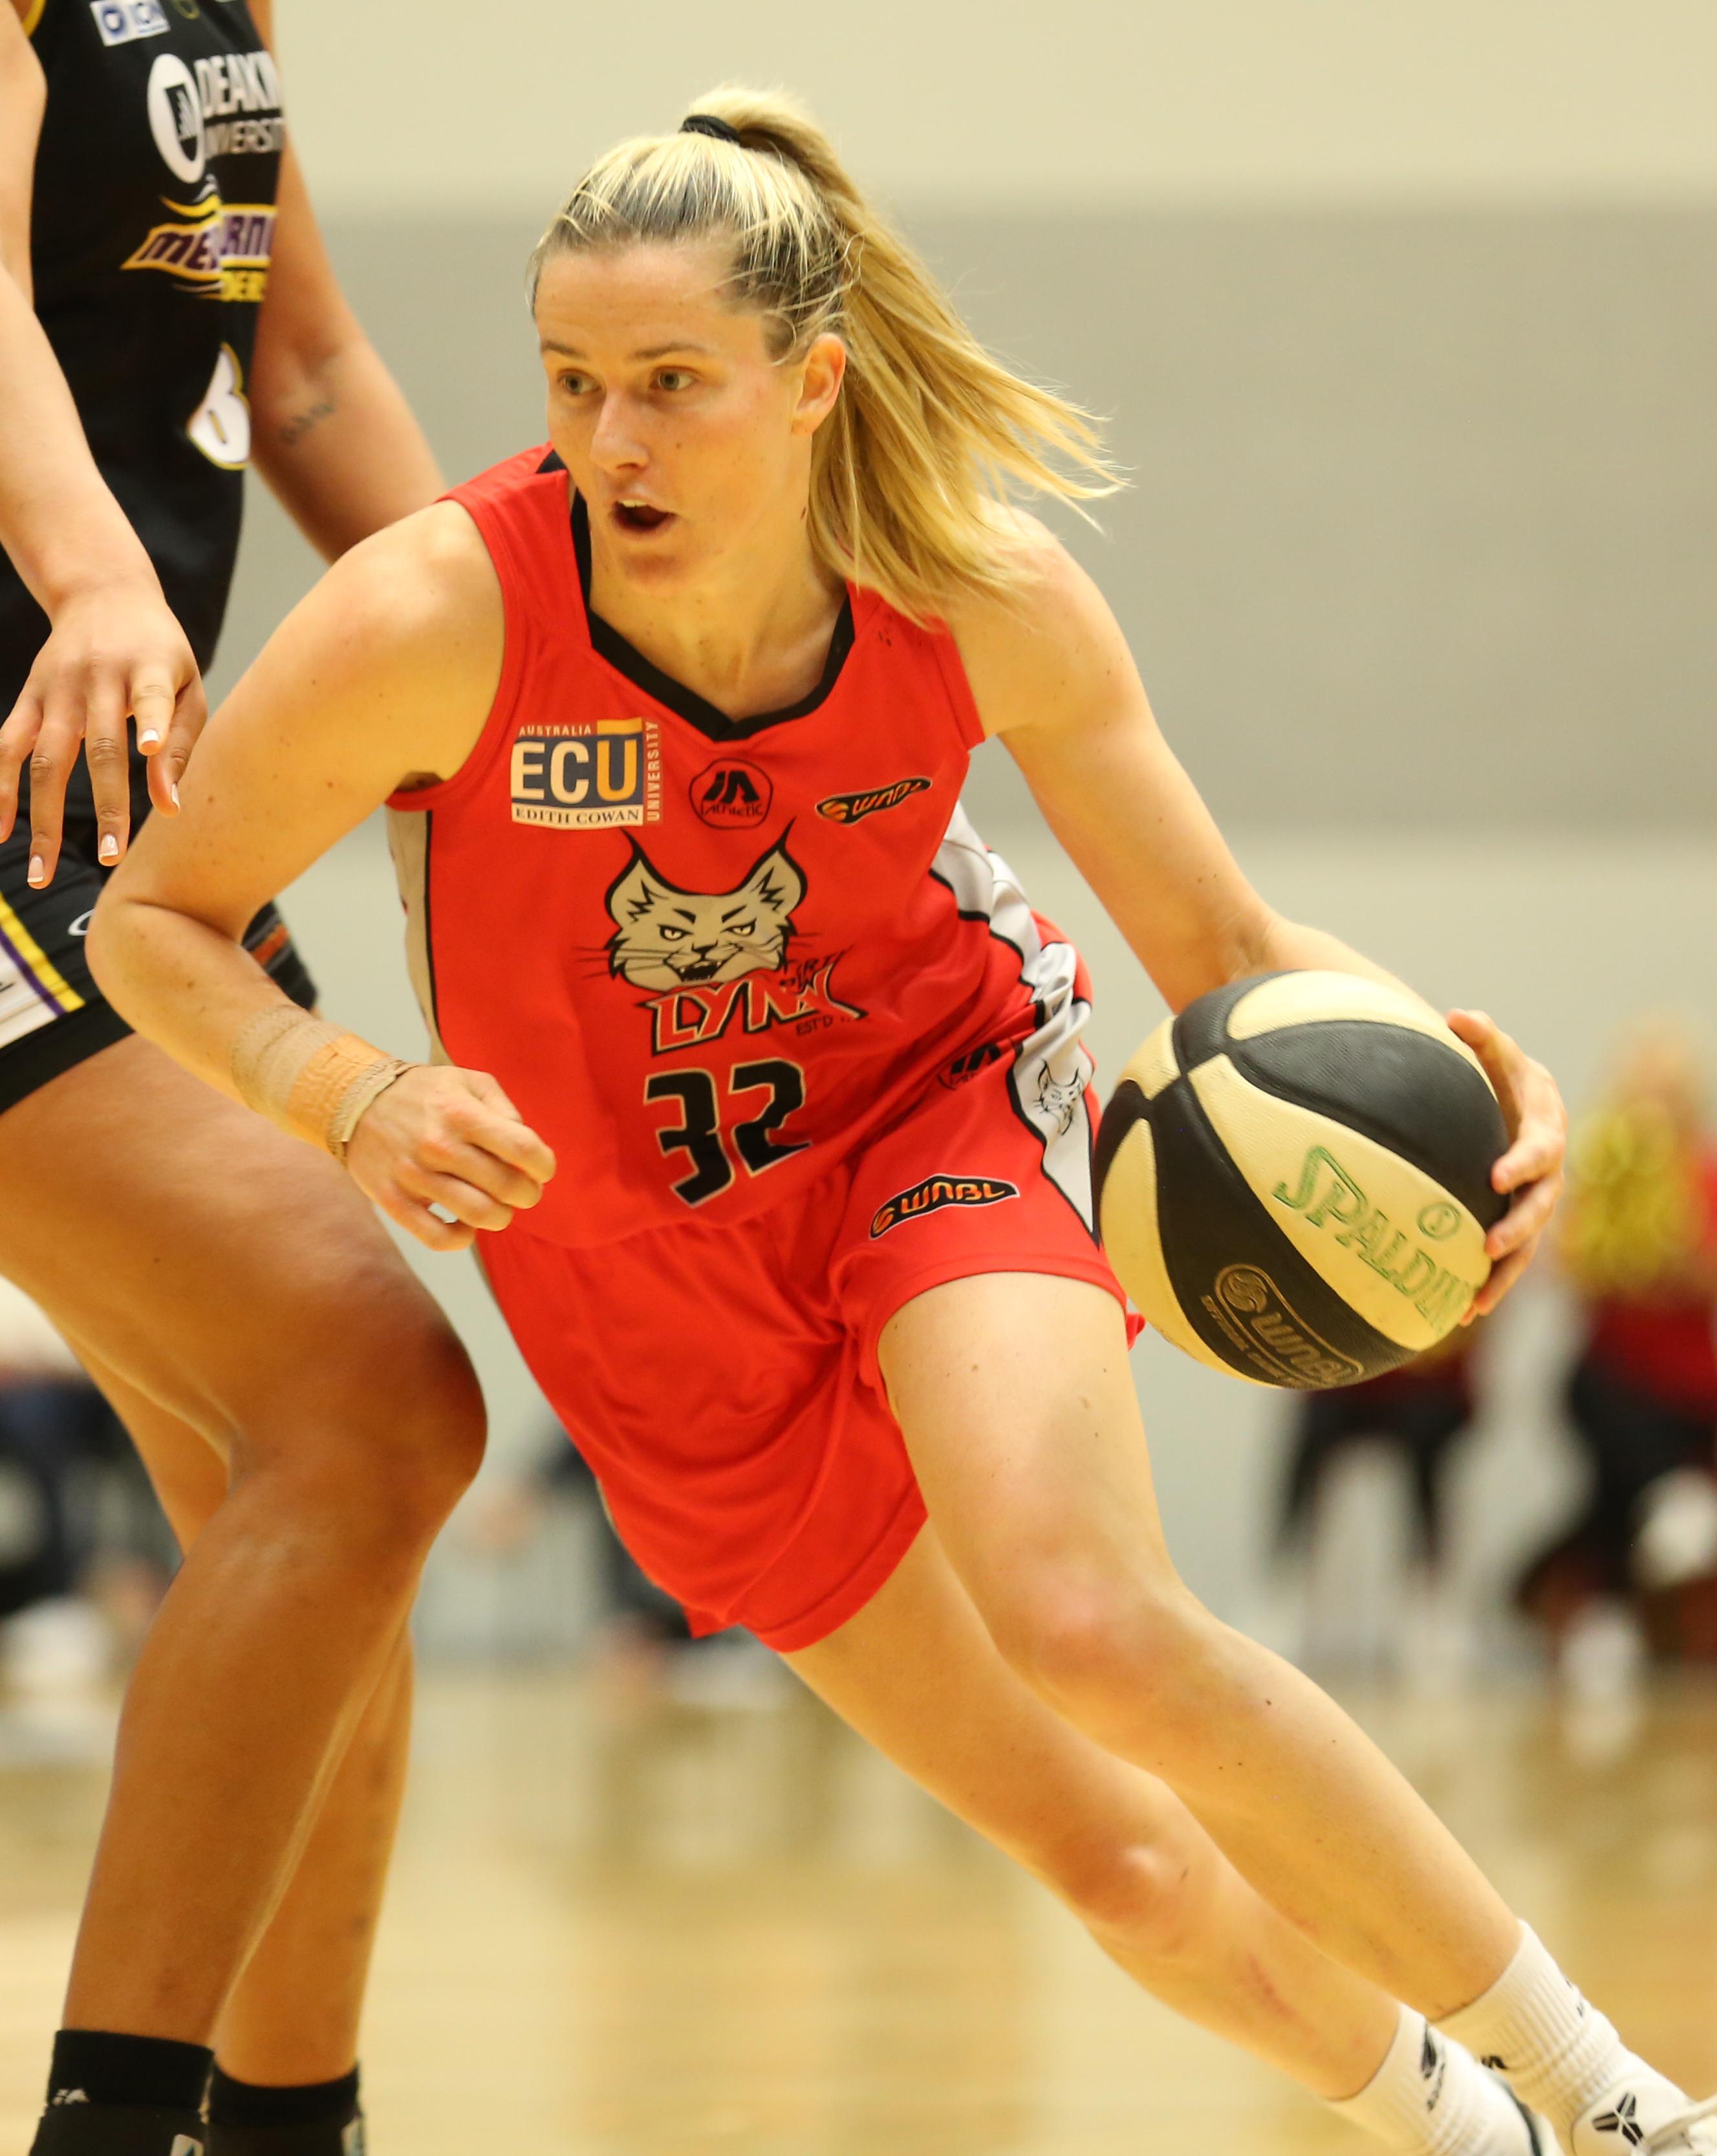 Female players Australian nude basketball